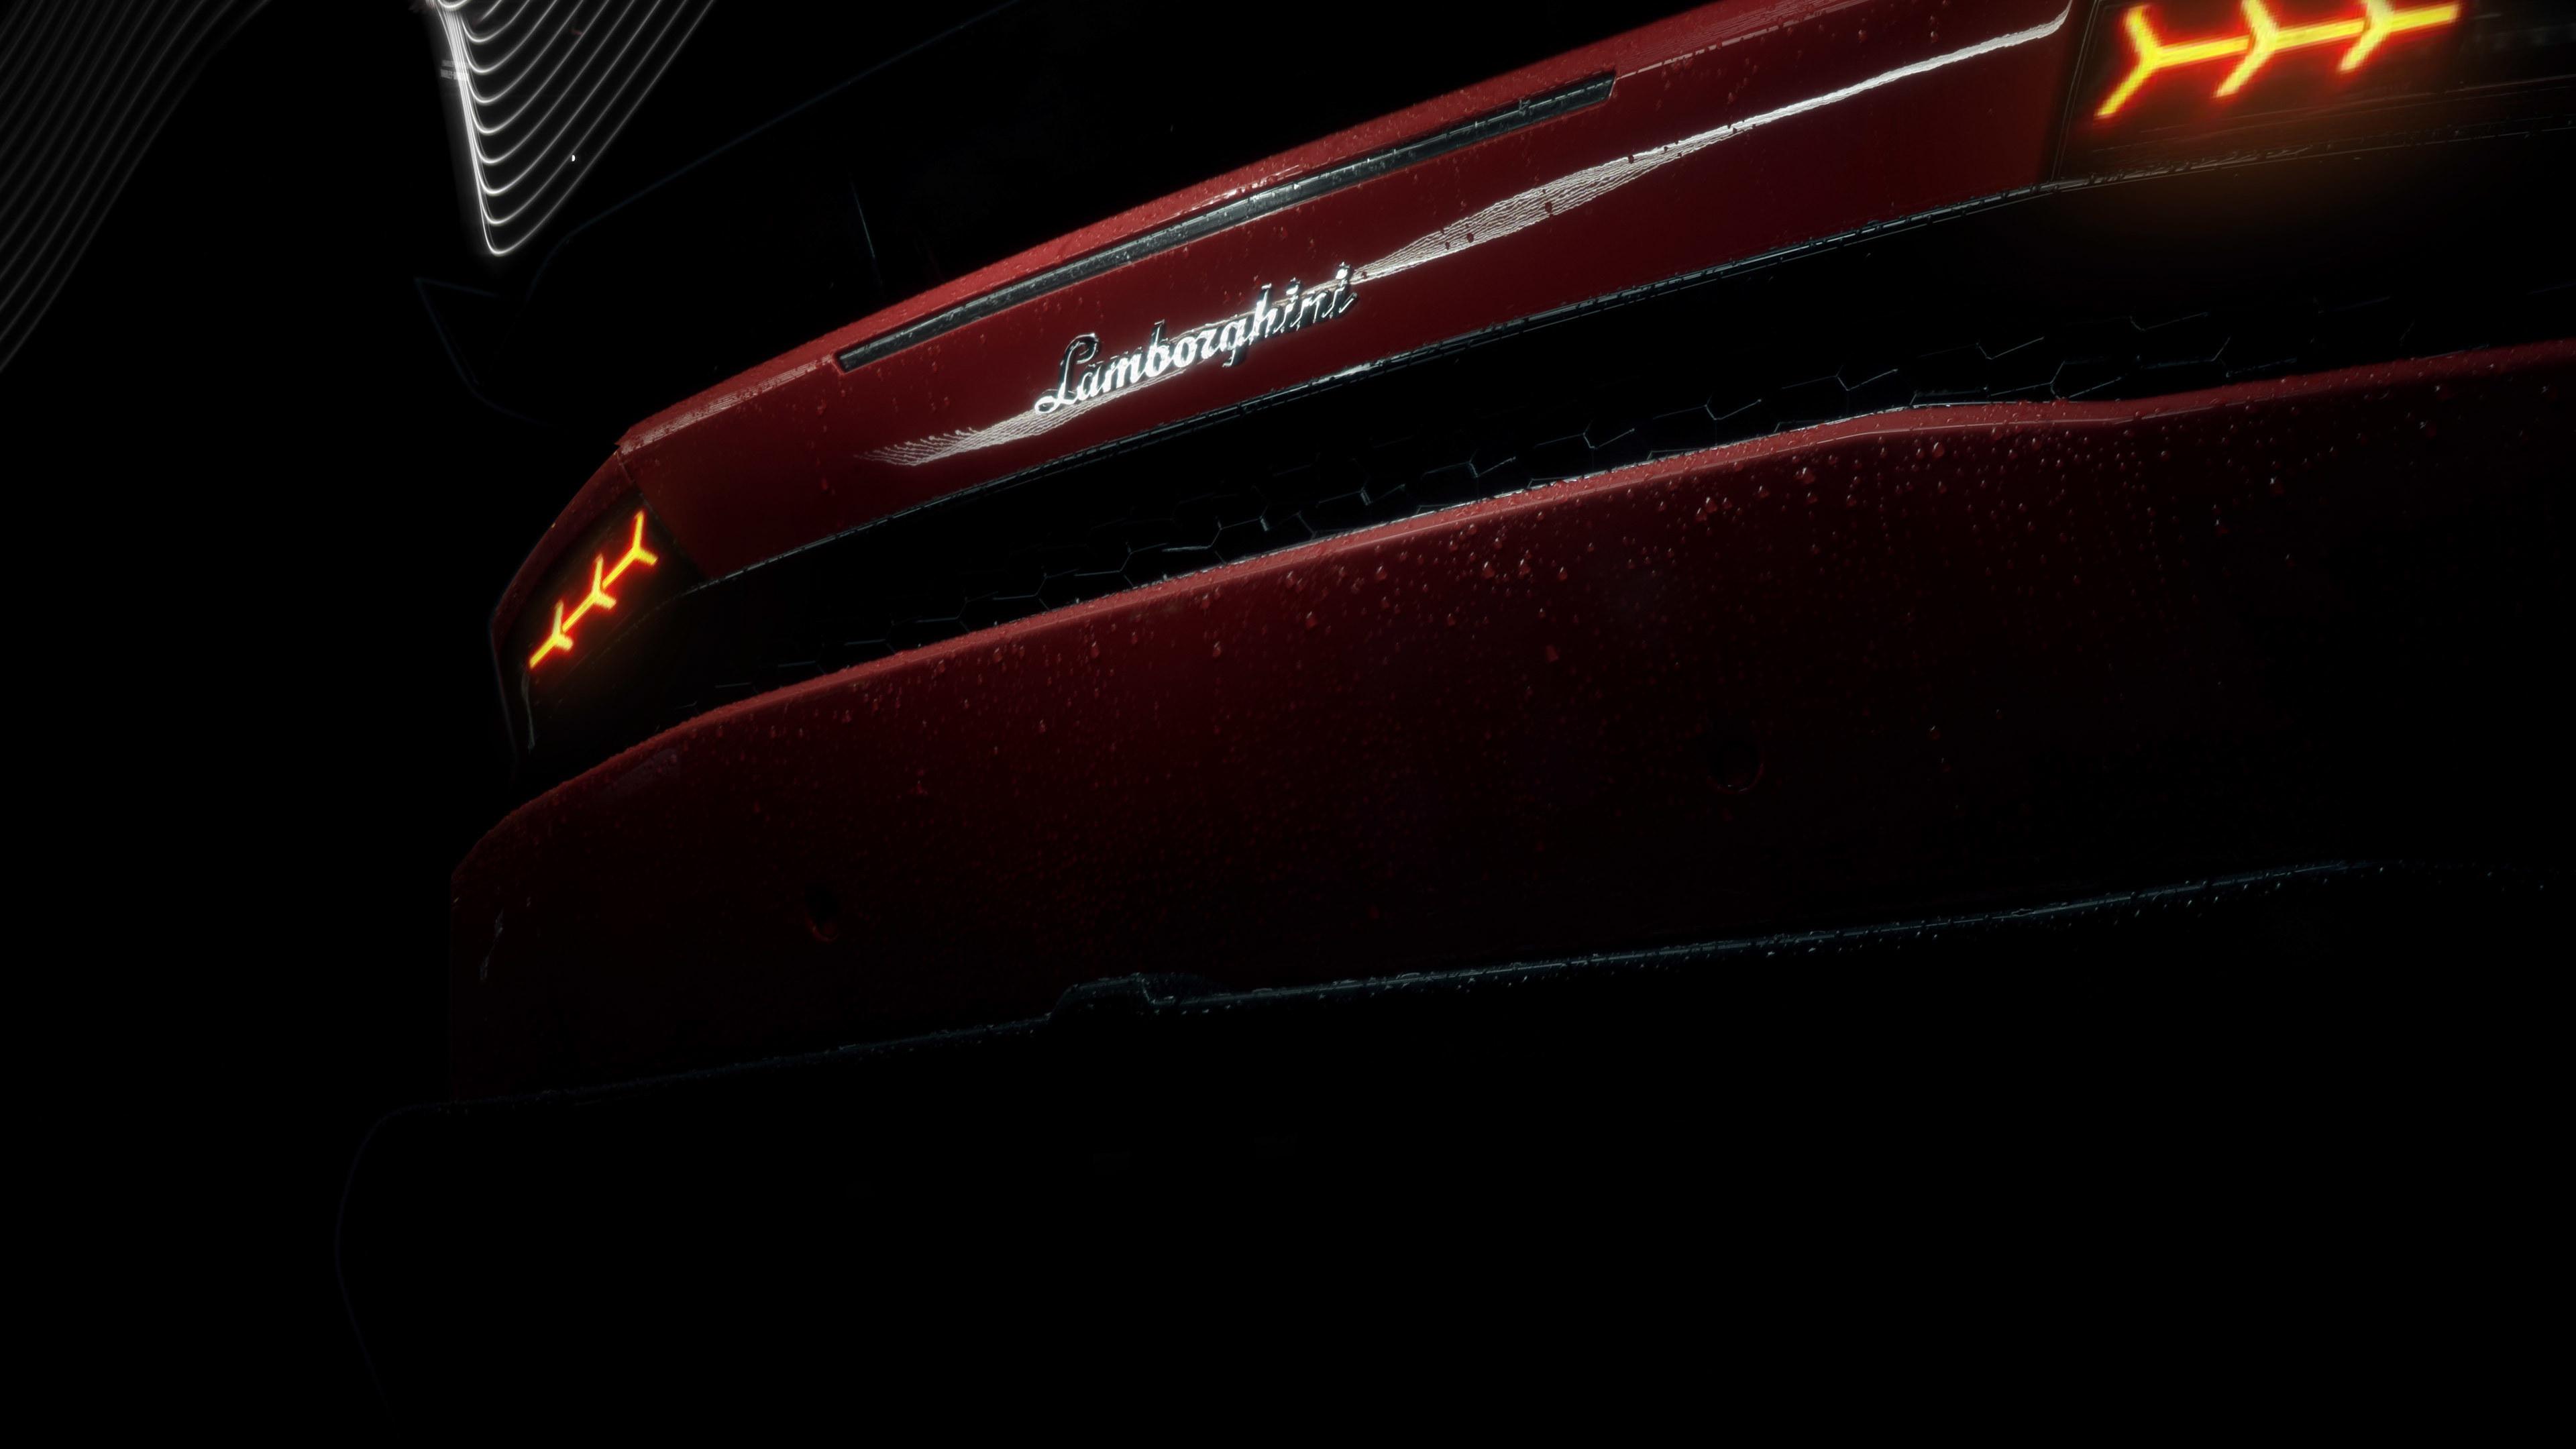 red lamborghini huracan rear lights 4k 1539114284 - Red Lamborghini Huracan Rear Lights 4k - lamborghini wallpapers, lamborghini huracan wallpapers, hd-wallpapers, cars wallpapers, behance wallpapers, artist wallpapers, 4k-wallpapers